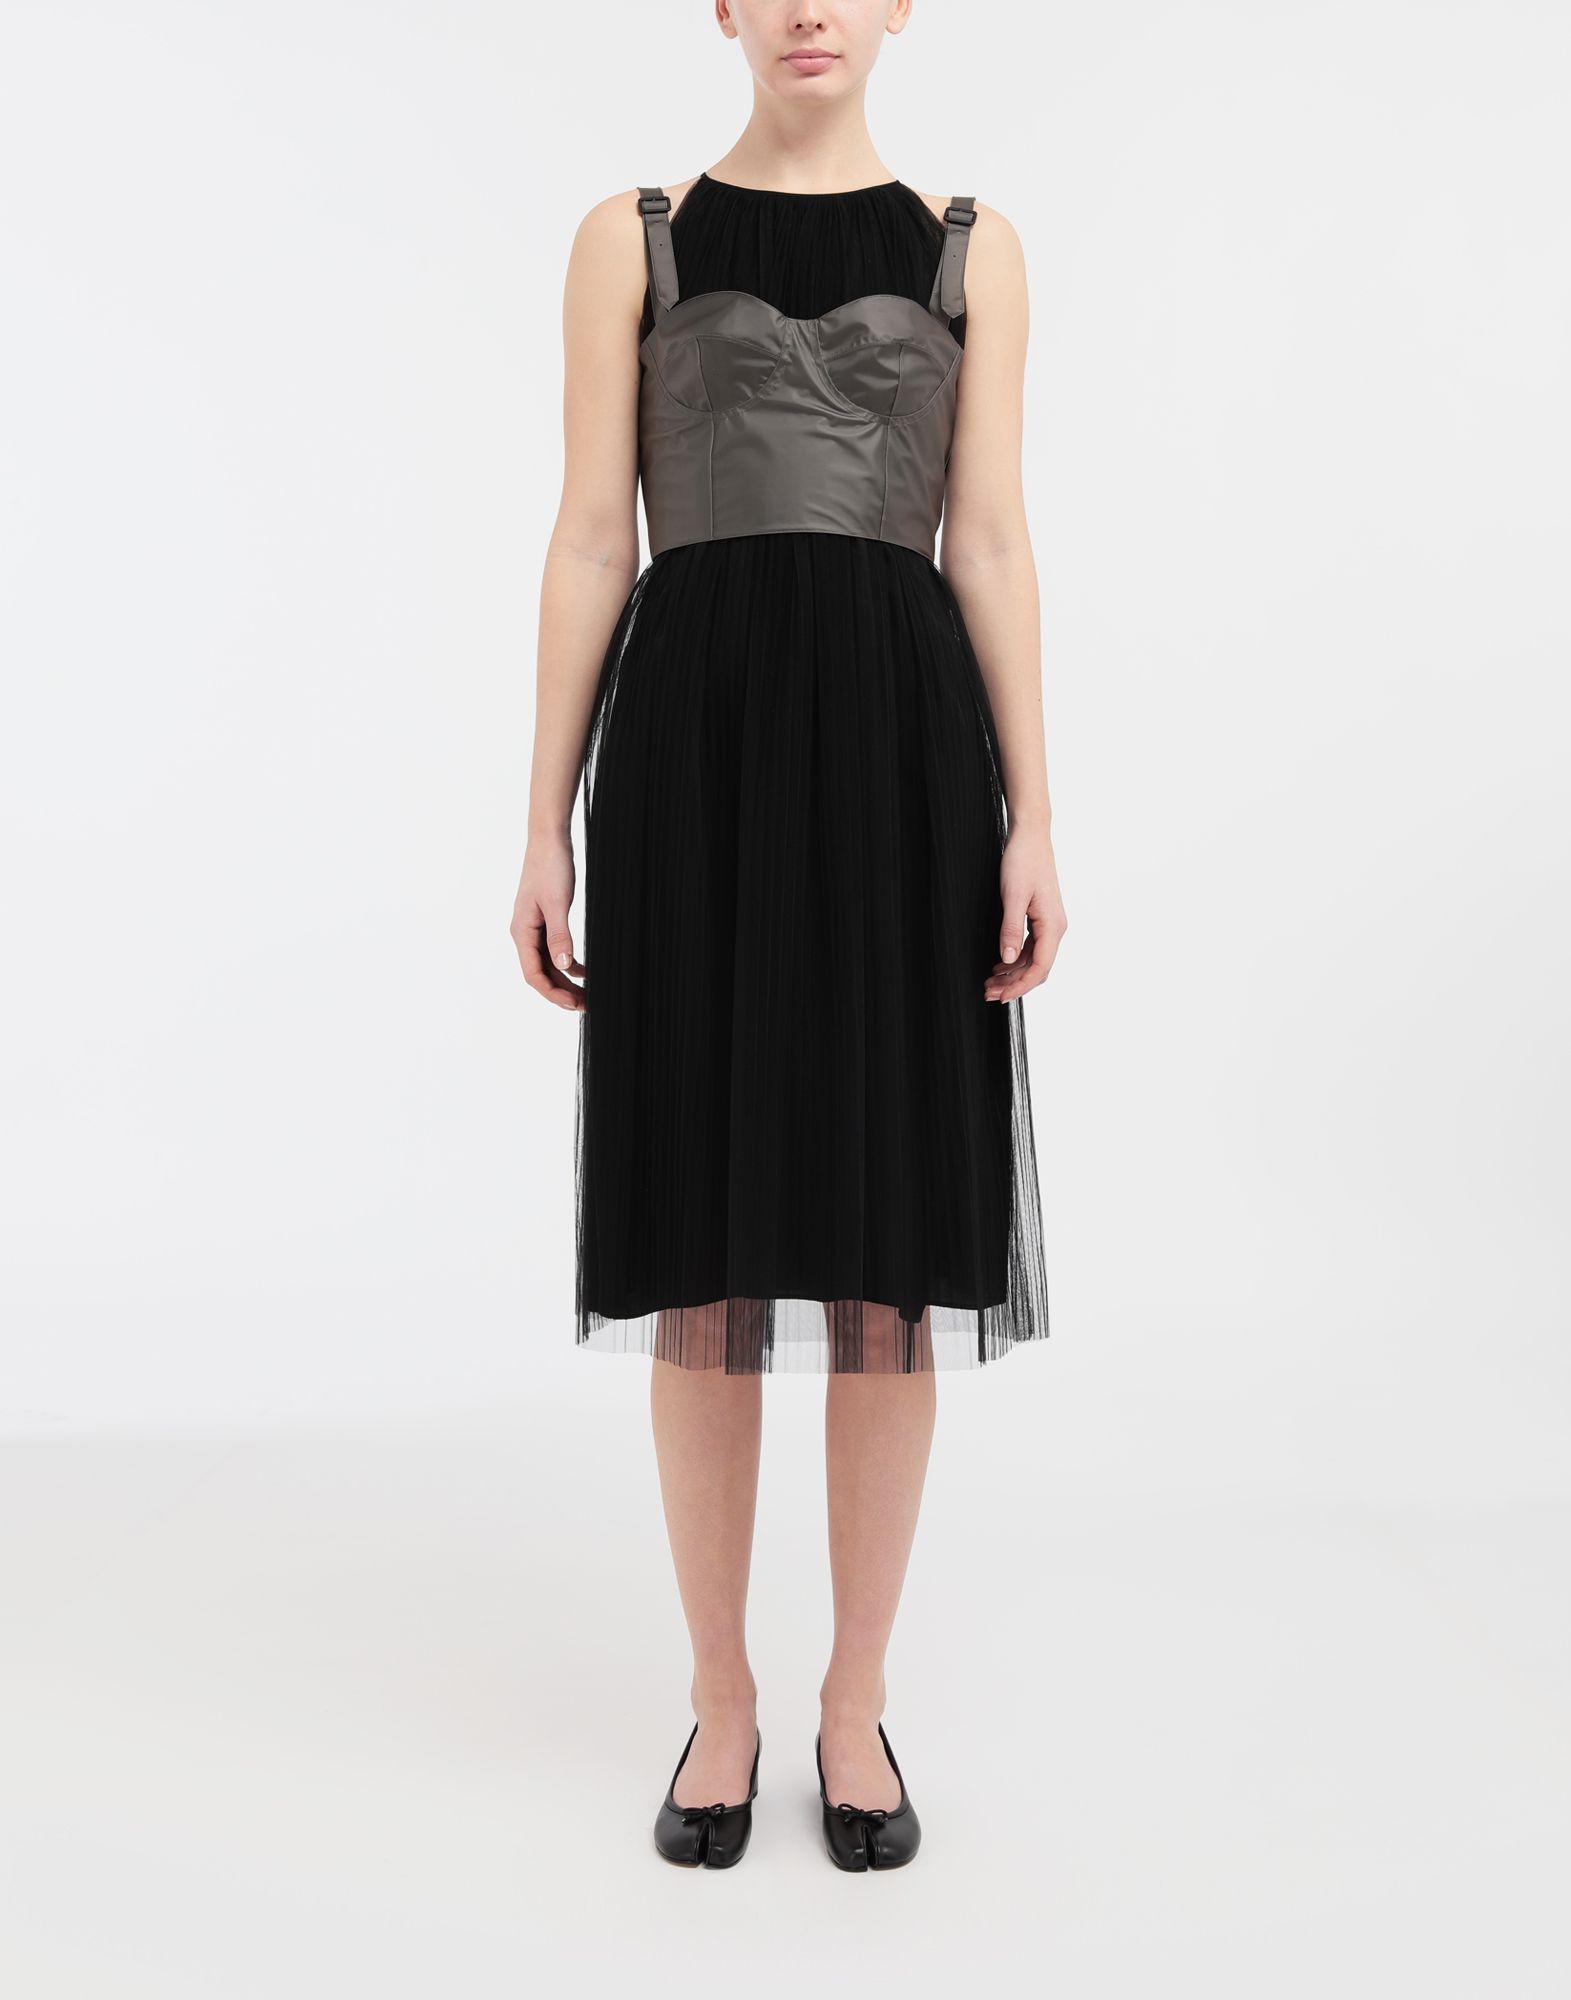 MAISON MARGIELA Layered tulle midi dress 3/4 length dress Woman r